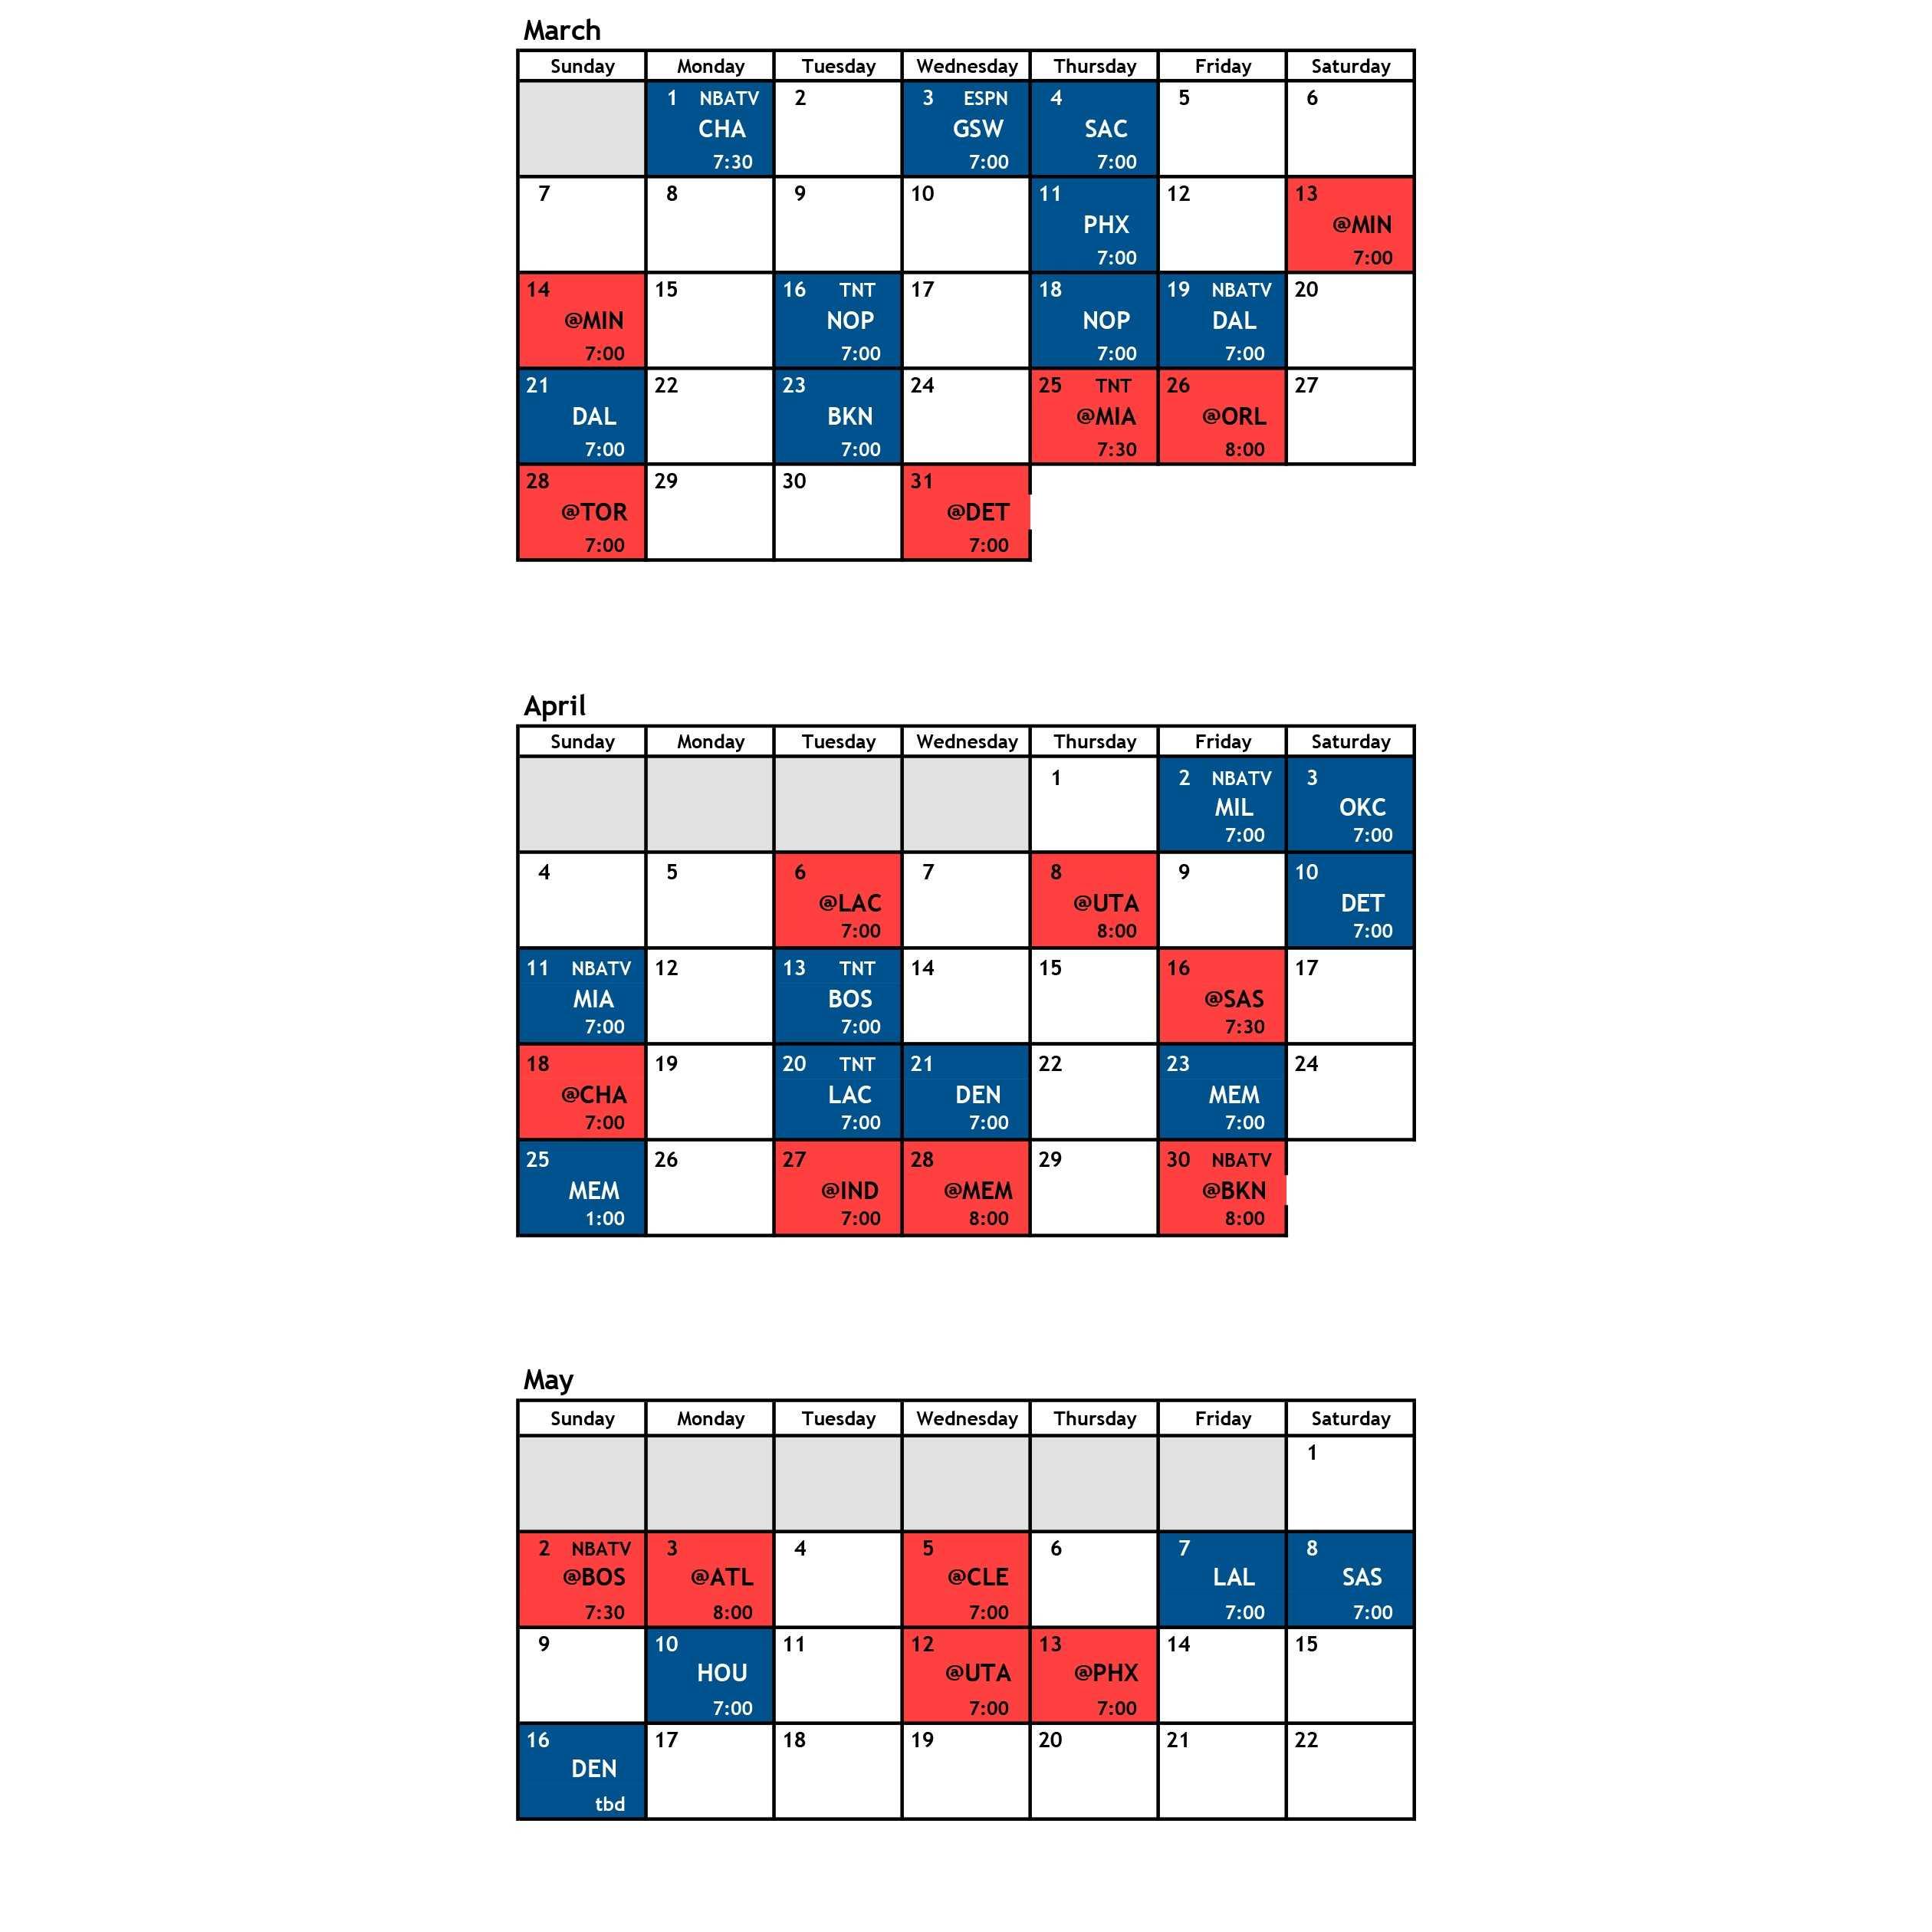 Portland Trail Blazers Second Half Schedule Breakdown